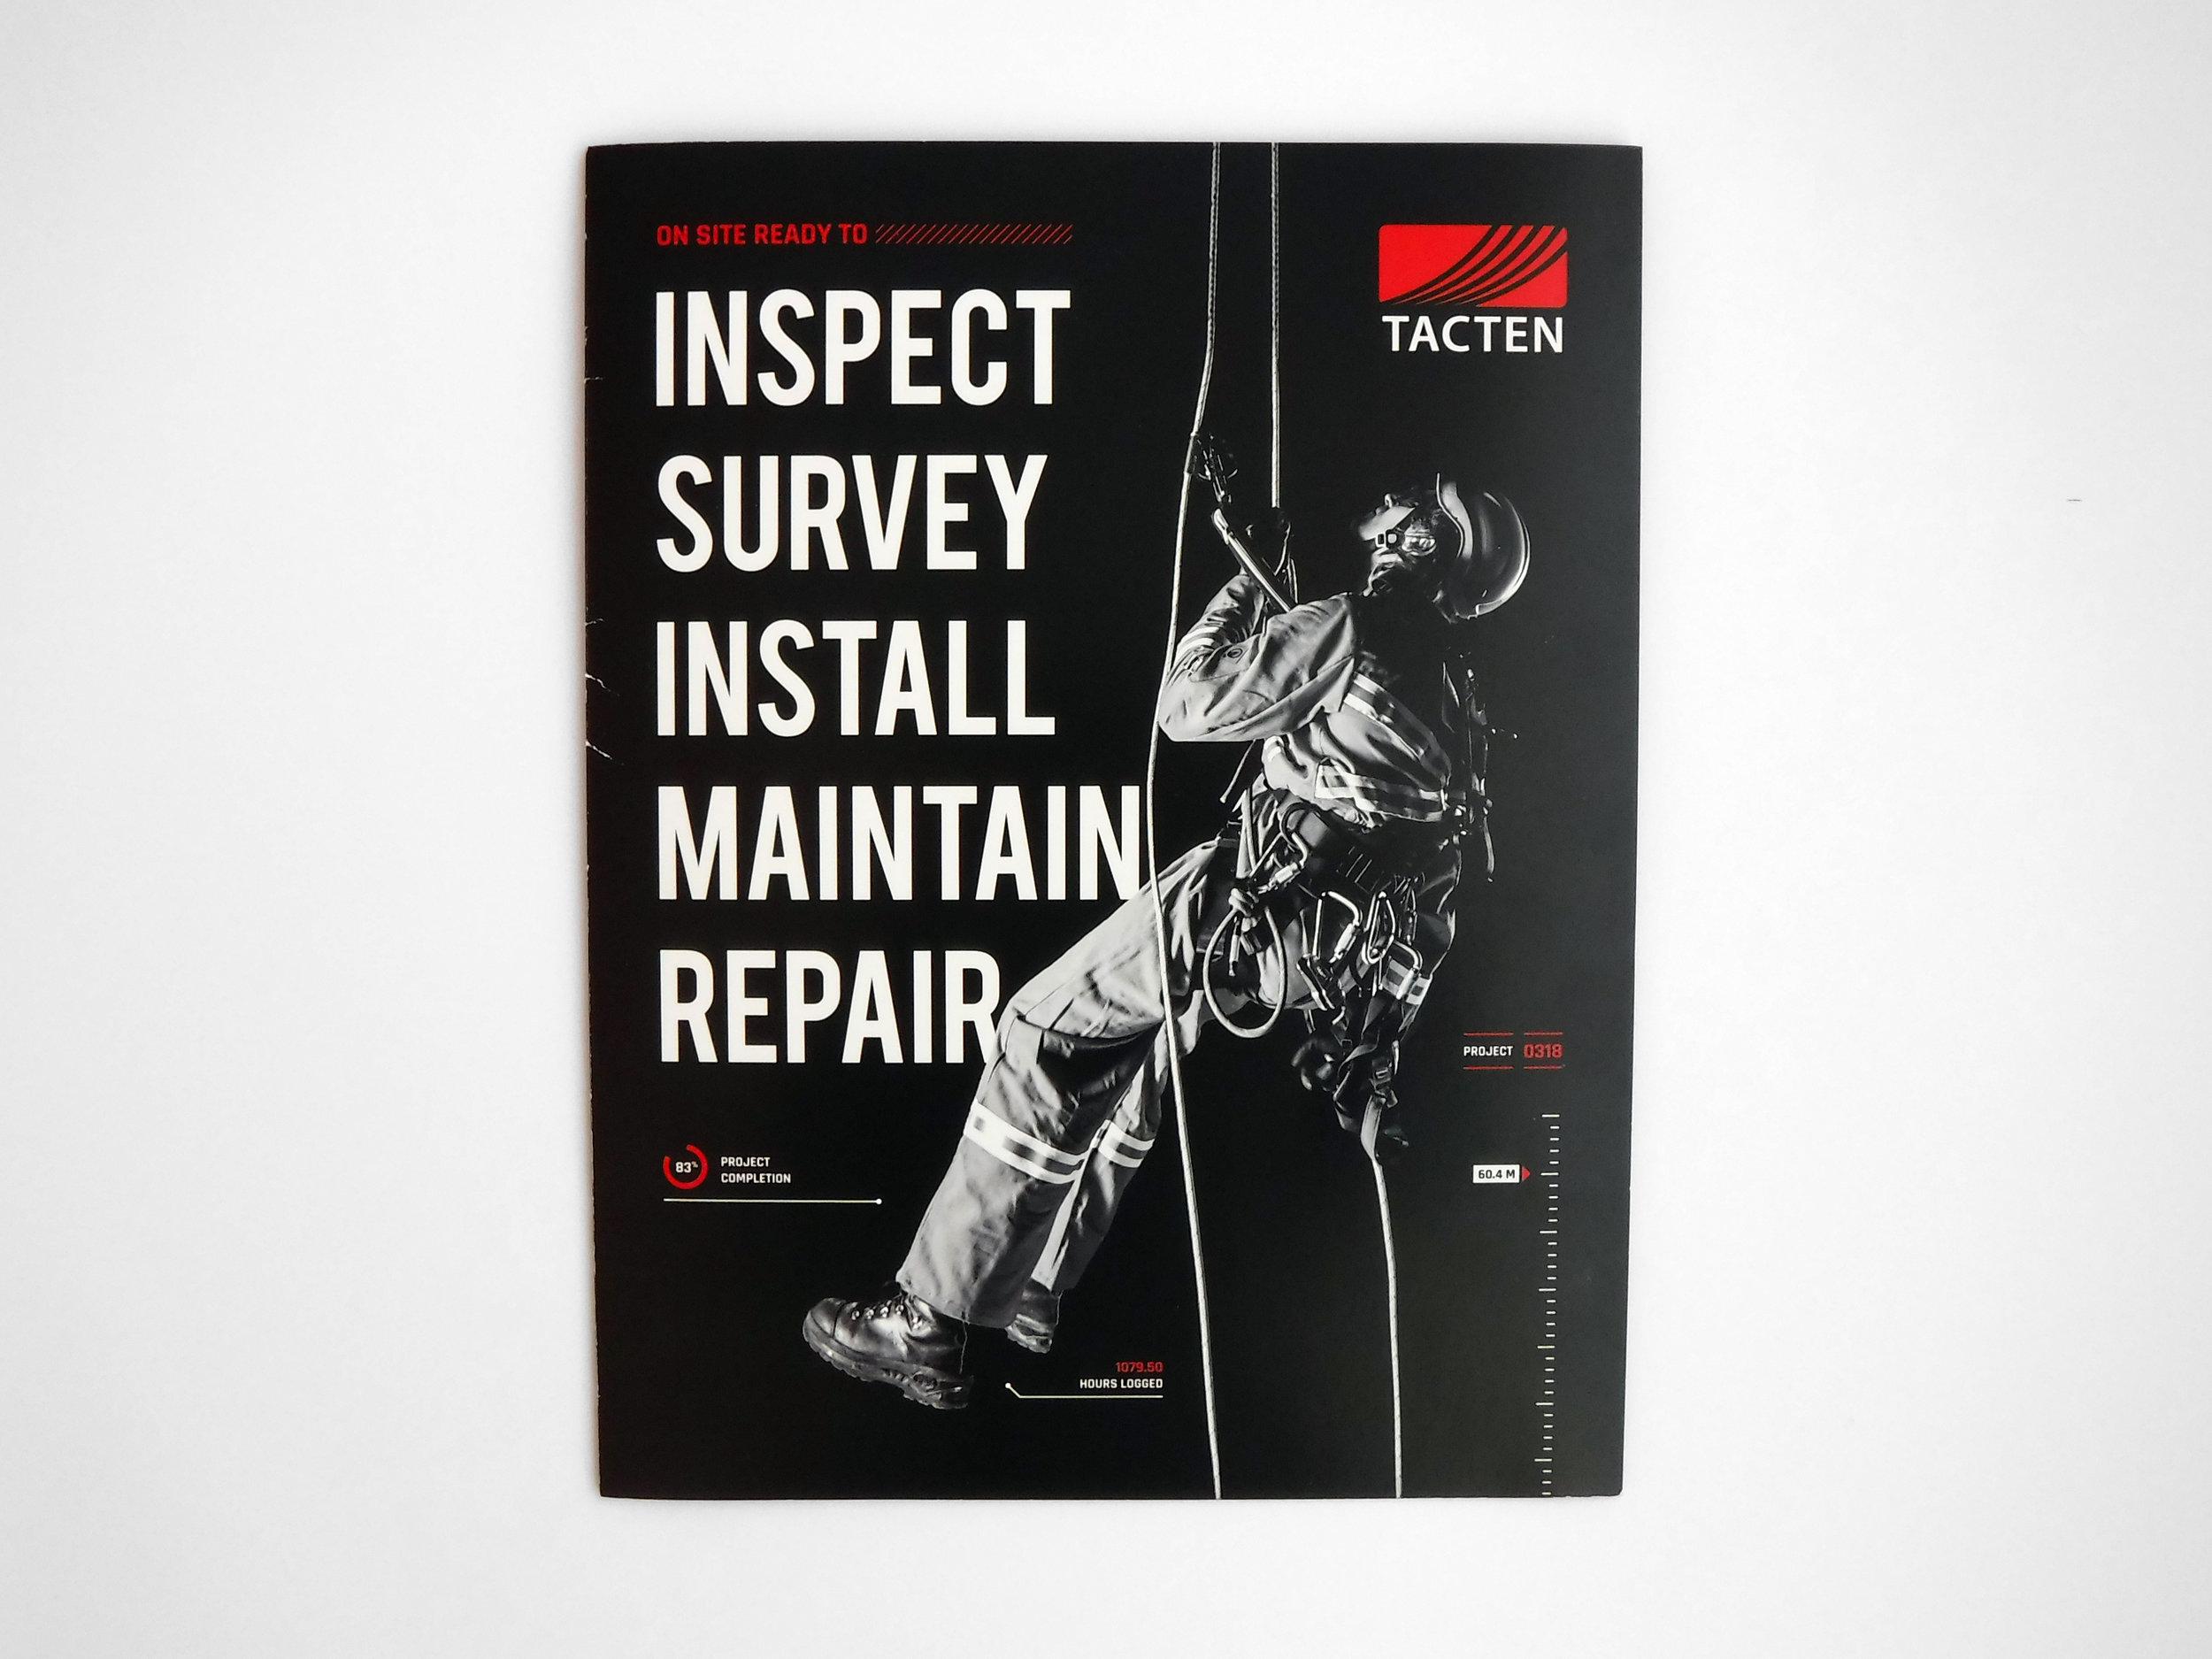 Natasia Designs Freelance Graphic Designer and Branding Expert based out of Edmonton, Alberta - Tacten Brochure Design and Promotional Flyer